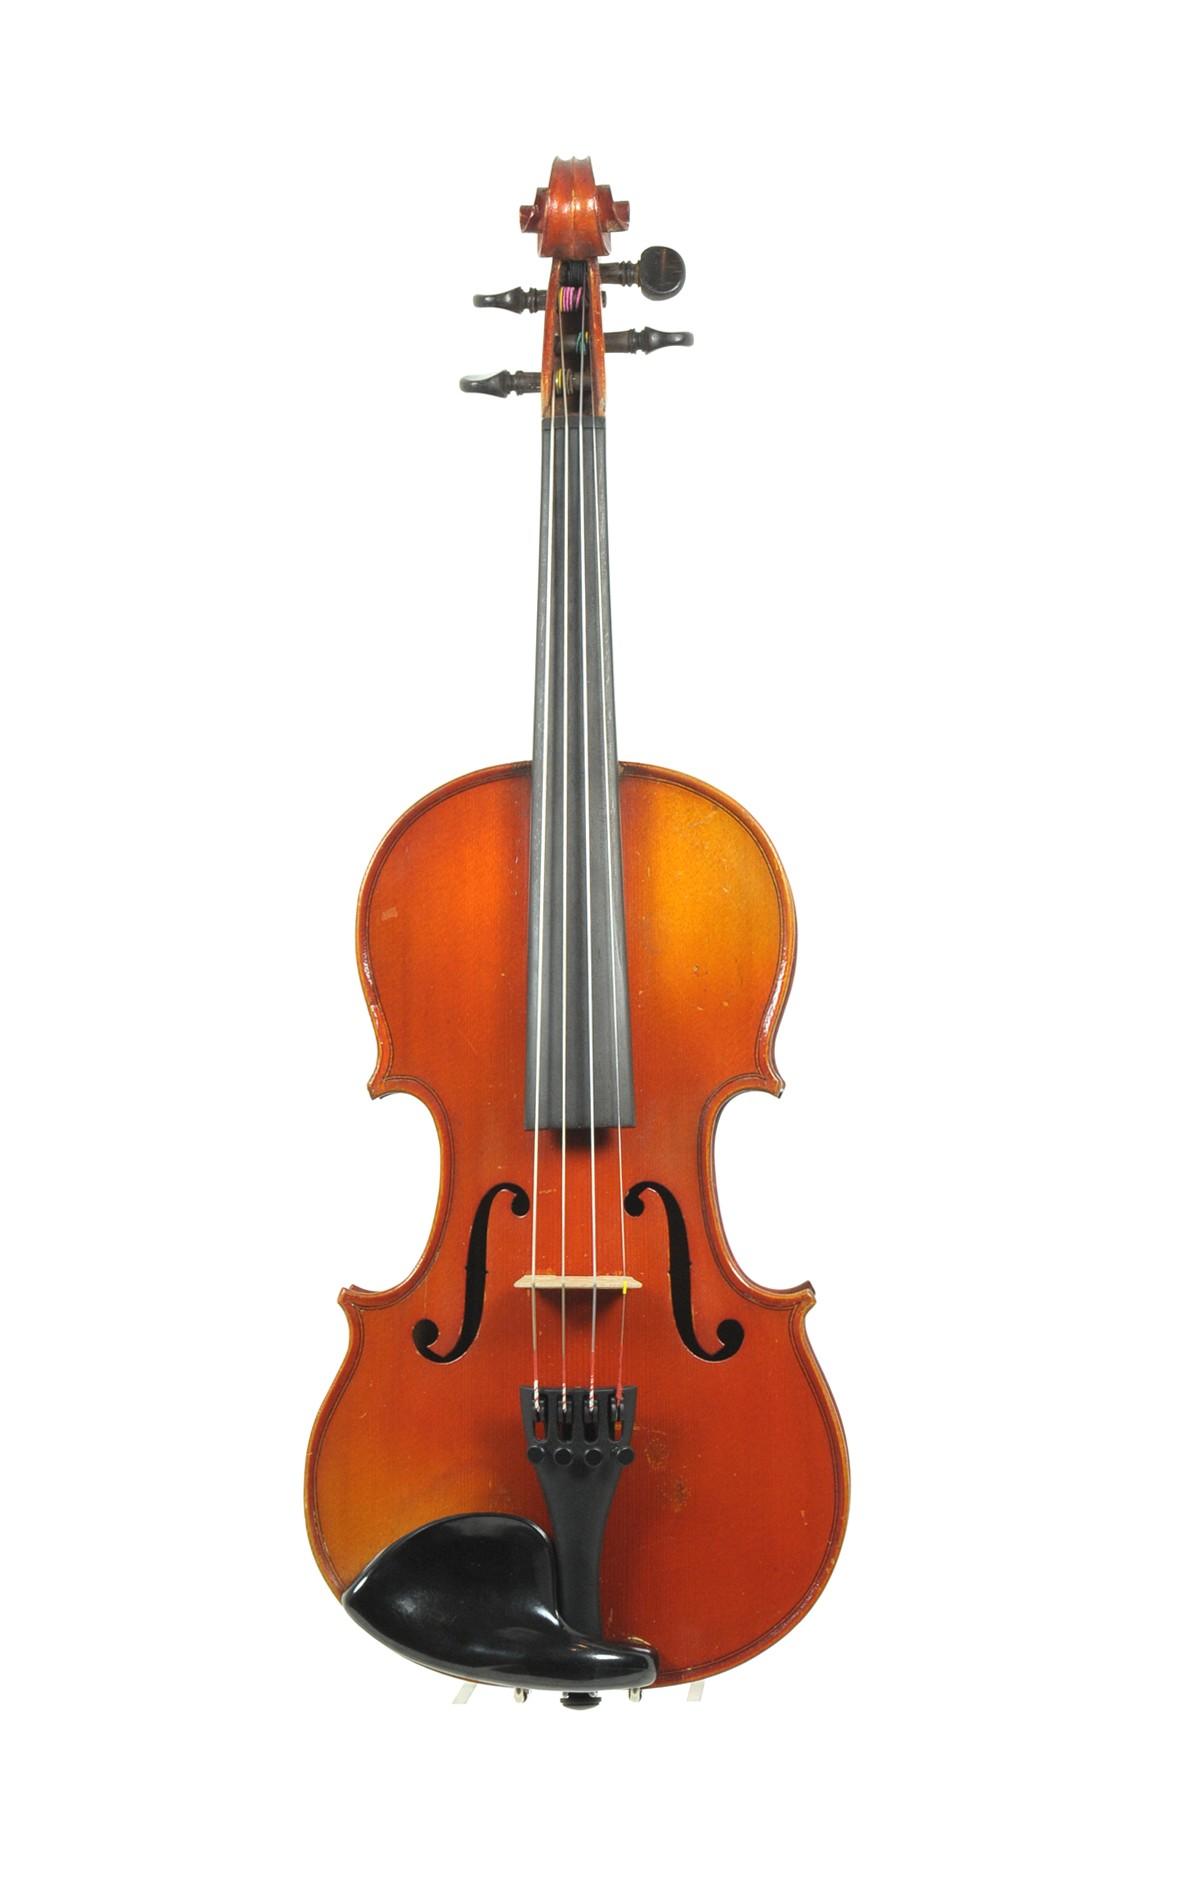 Mansuy 1/2 violin, Mirecourt - top